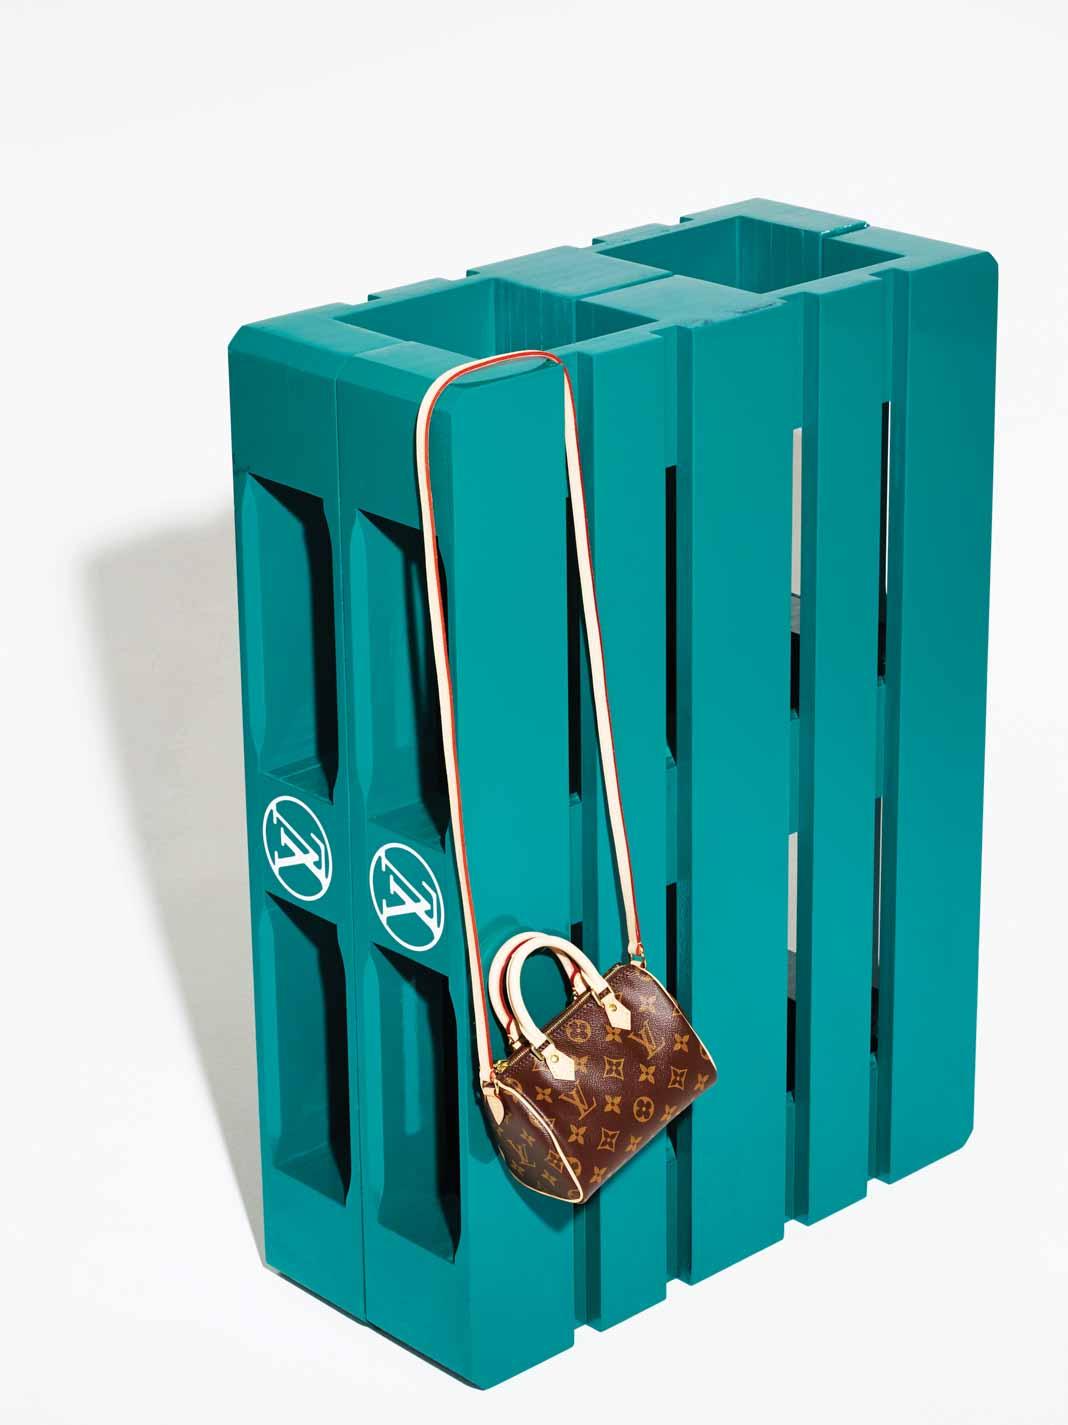 tui-nano-Louis-Vuitton-TT-619-2015-2